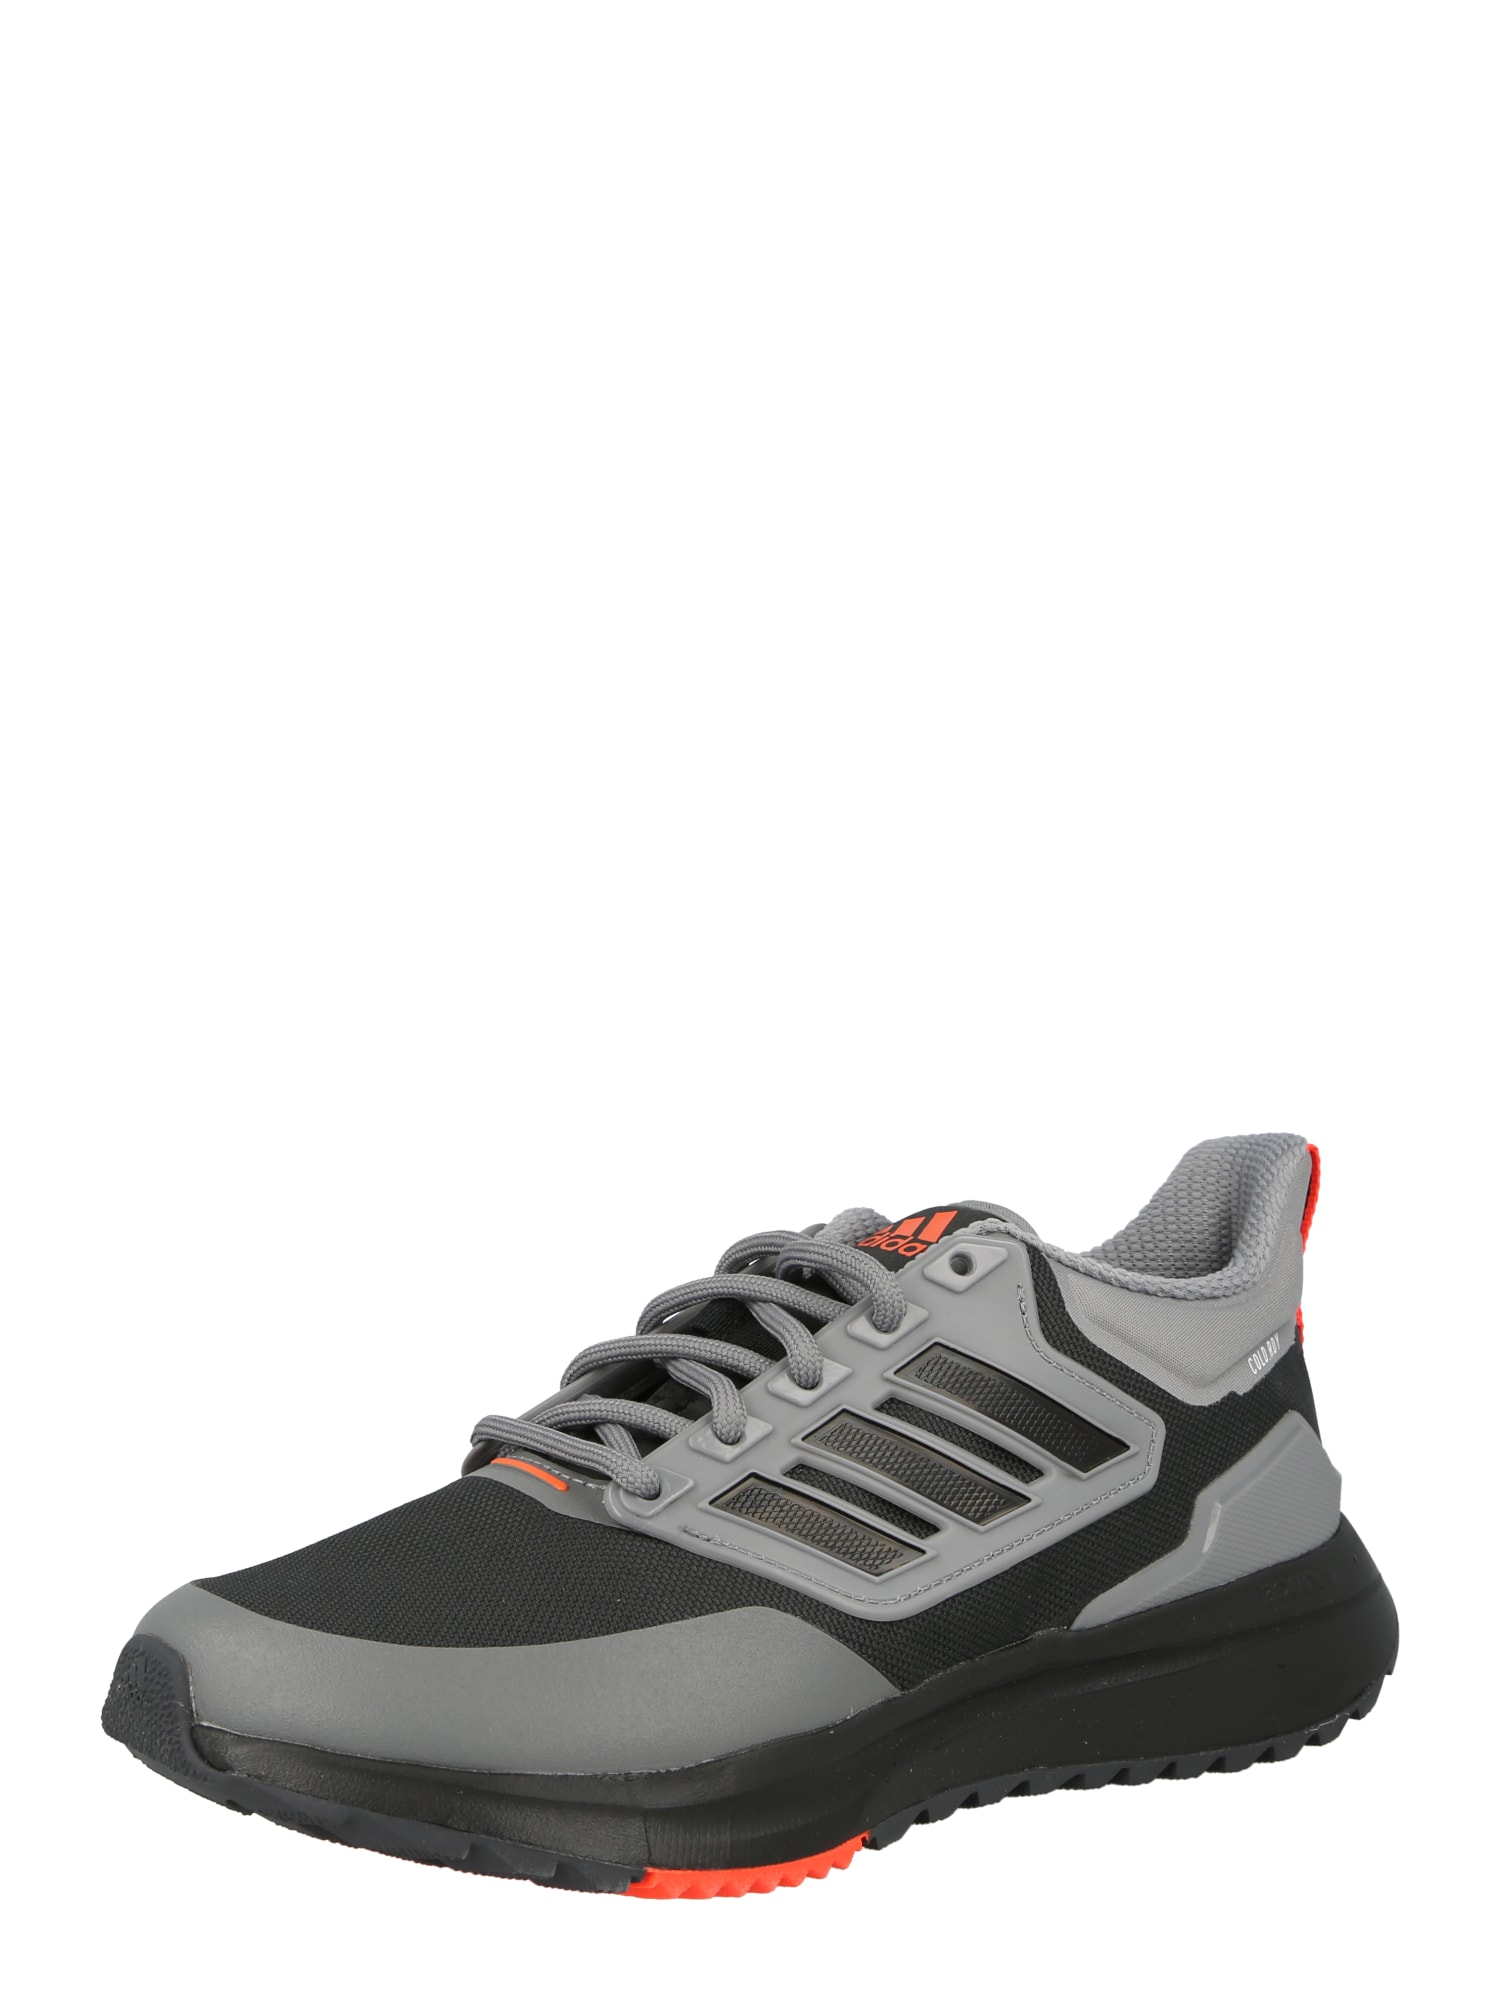 ADIDAS PERFORMANCE Běžecká obuv 'EQ21'  černá / šedá